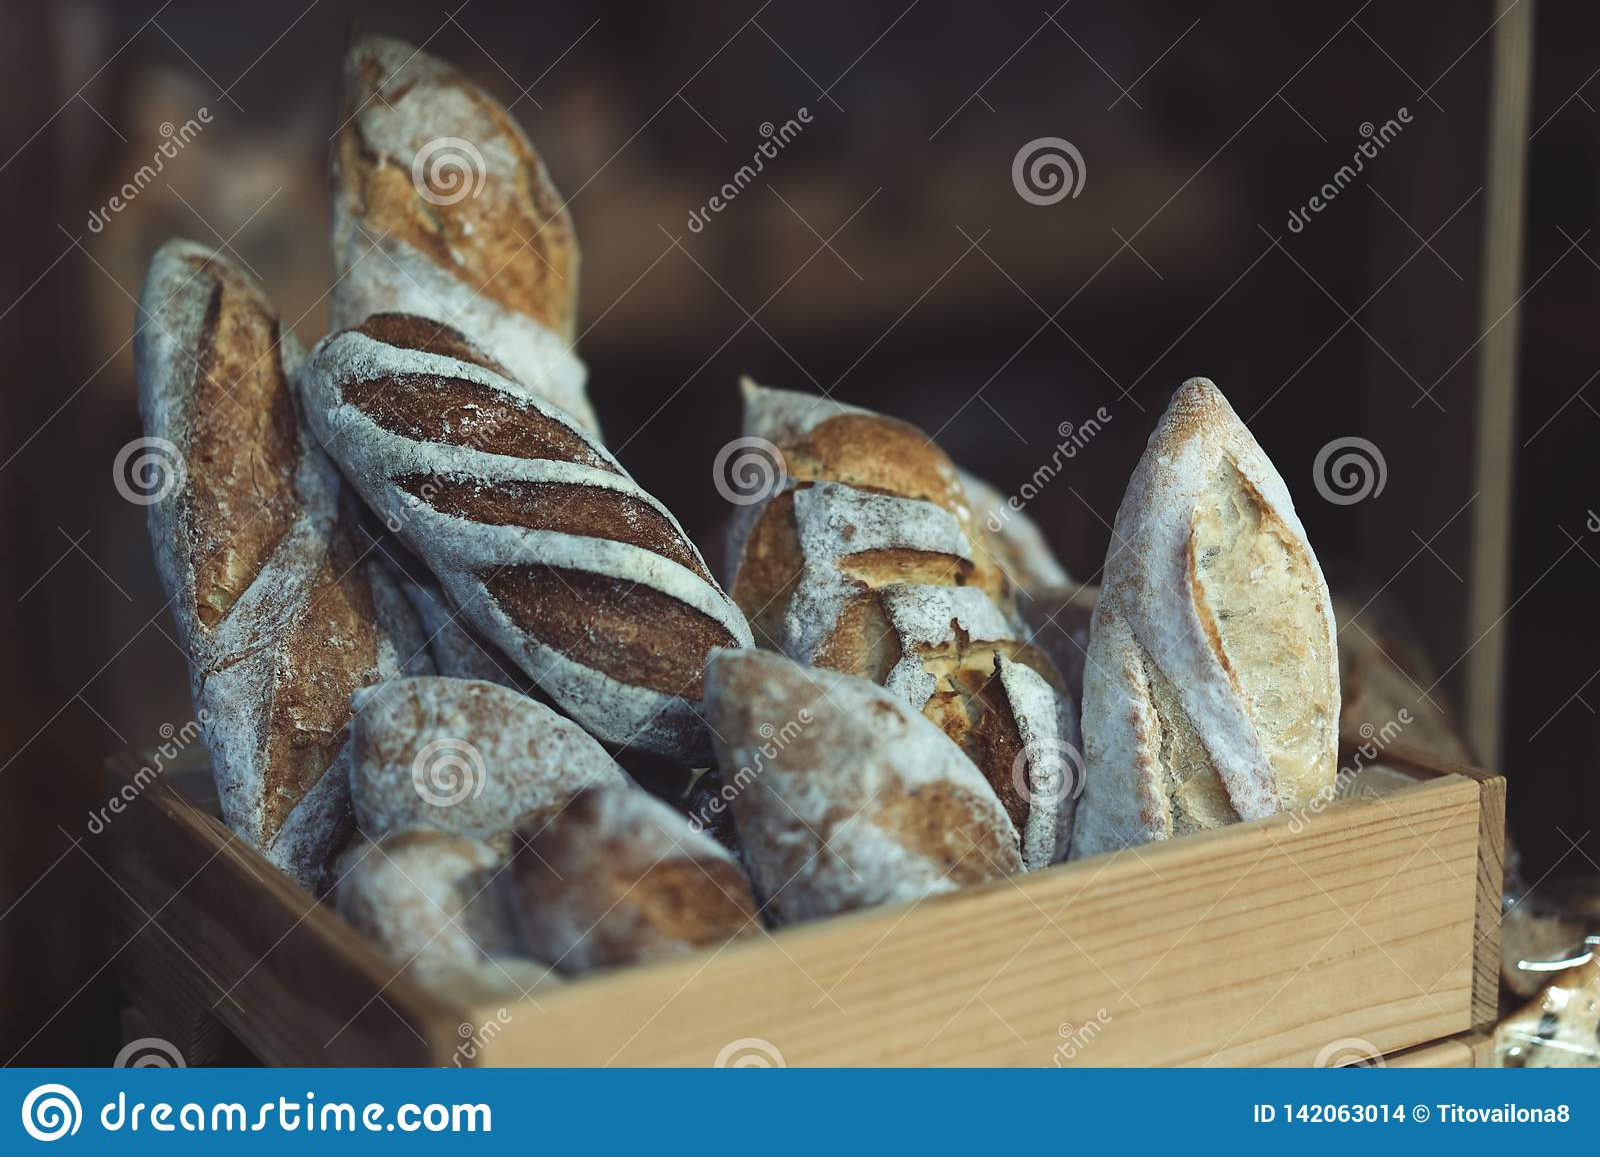 Panes del pan en una caja de madera